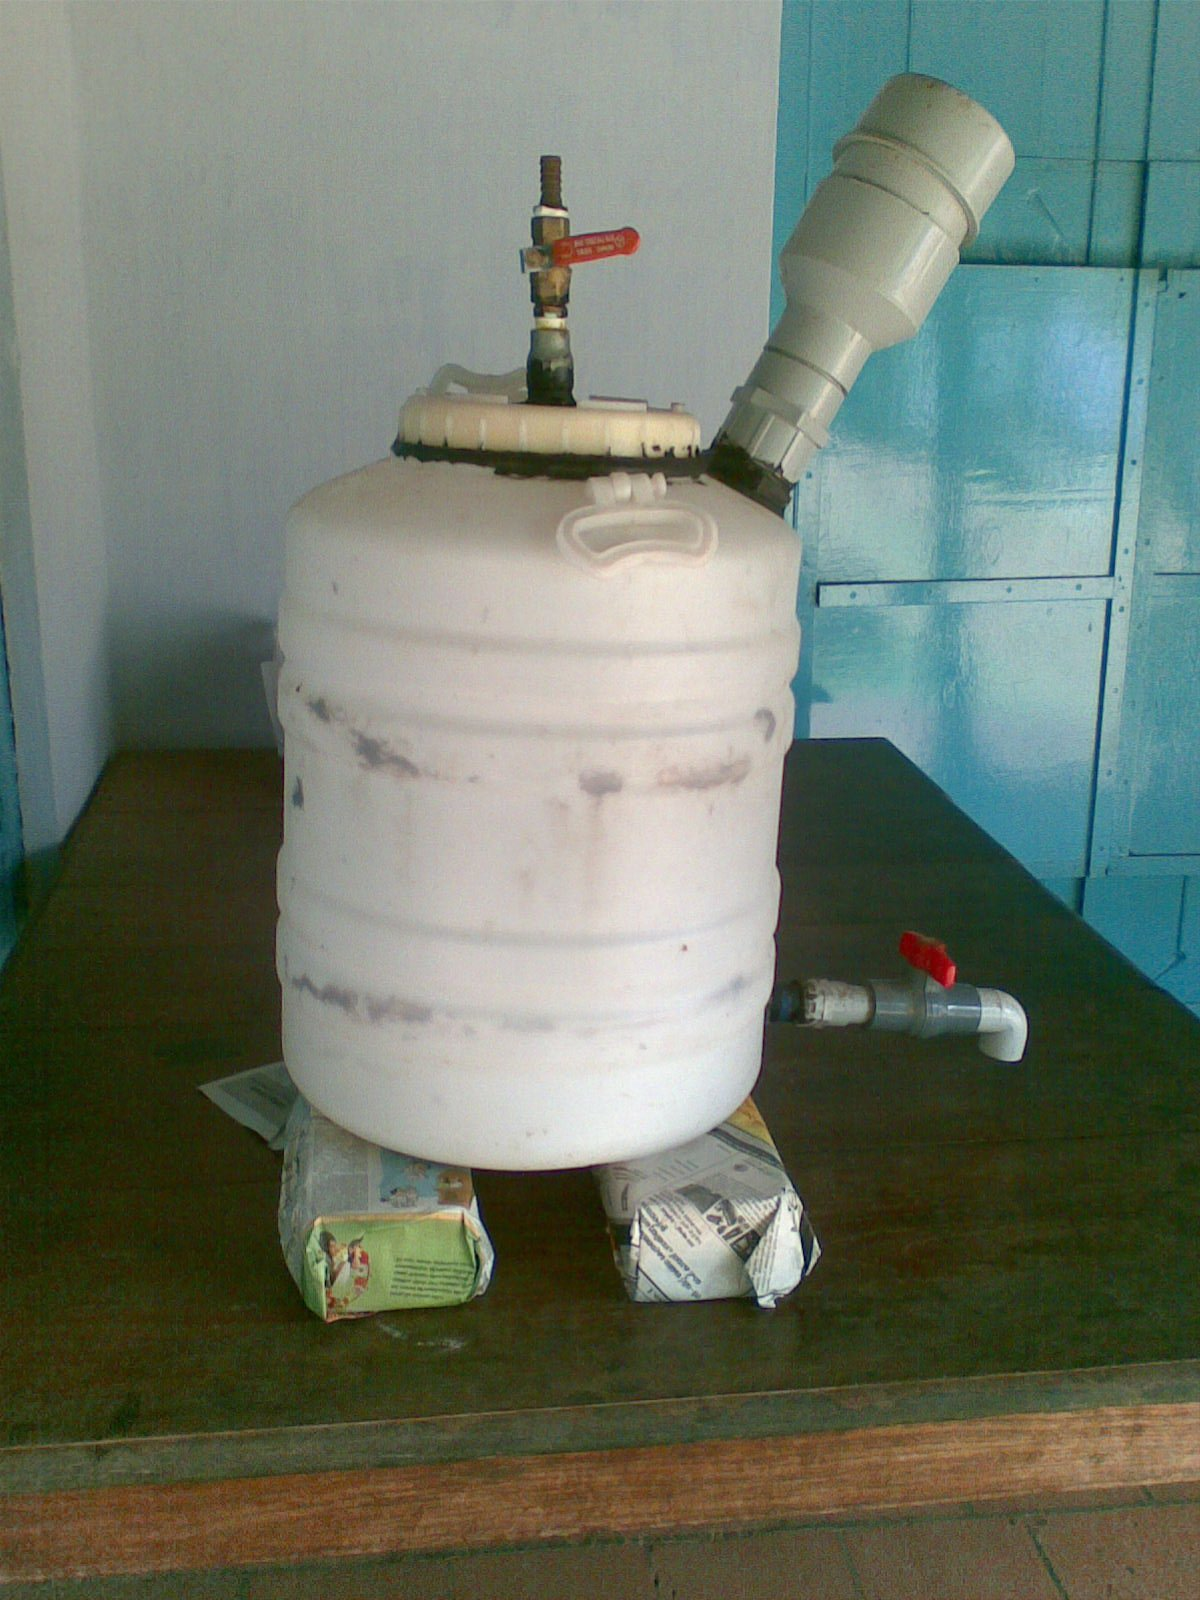 Mini Biogas Plant : Nicholson eco club bio gas plant working model which got